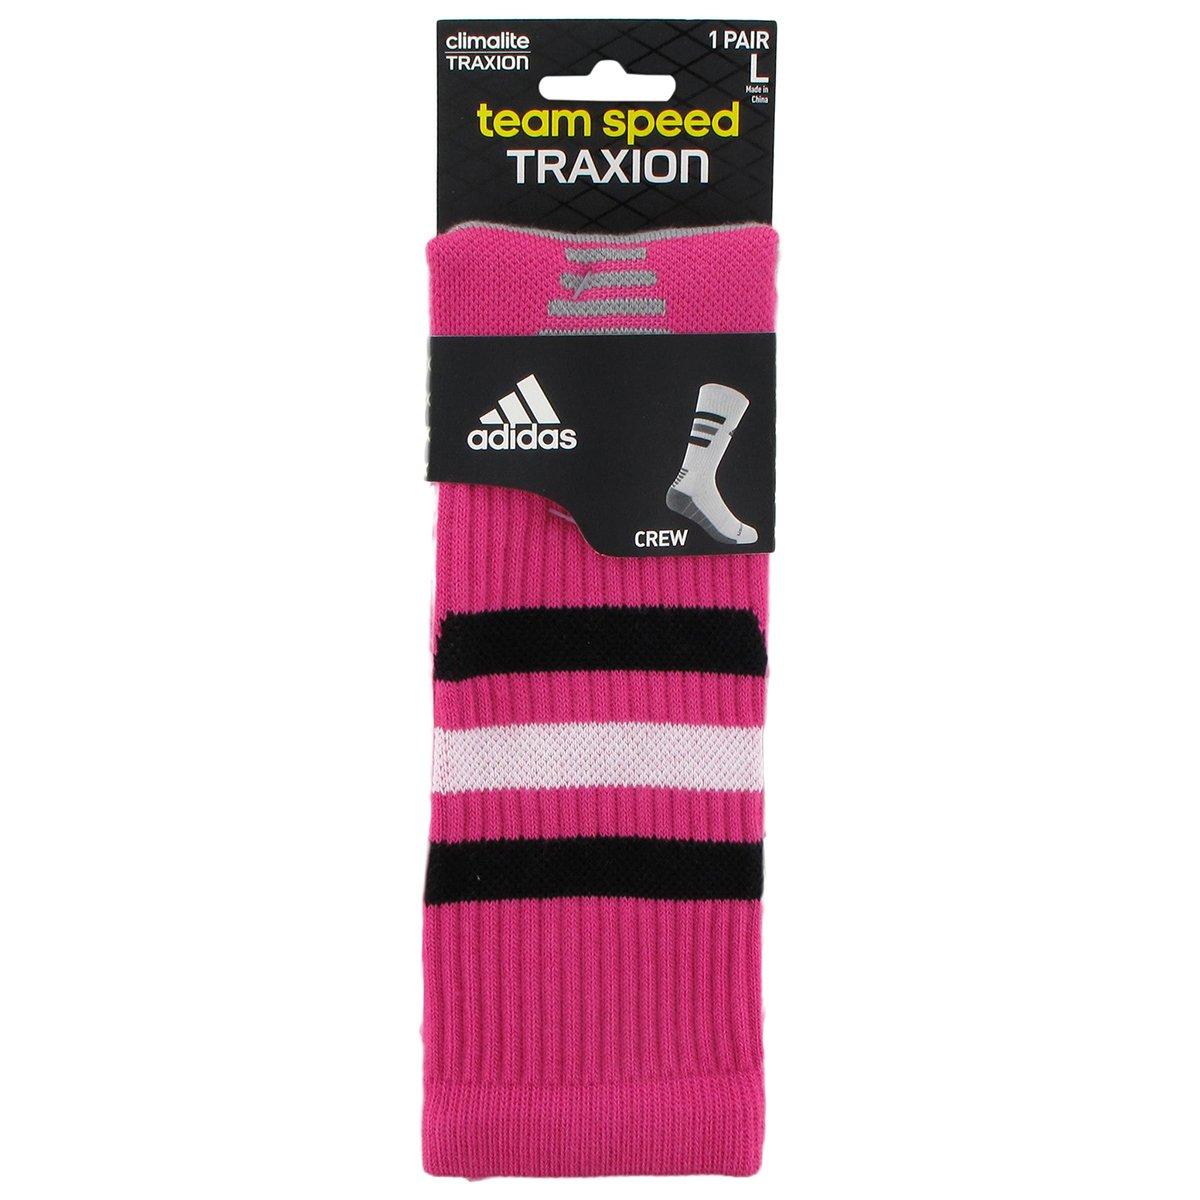 quality design 13821 b2410 Amazon.com  adidas Team Speed Traxion Crew Sock  Sports   Outdoors